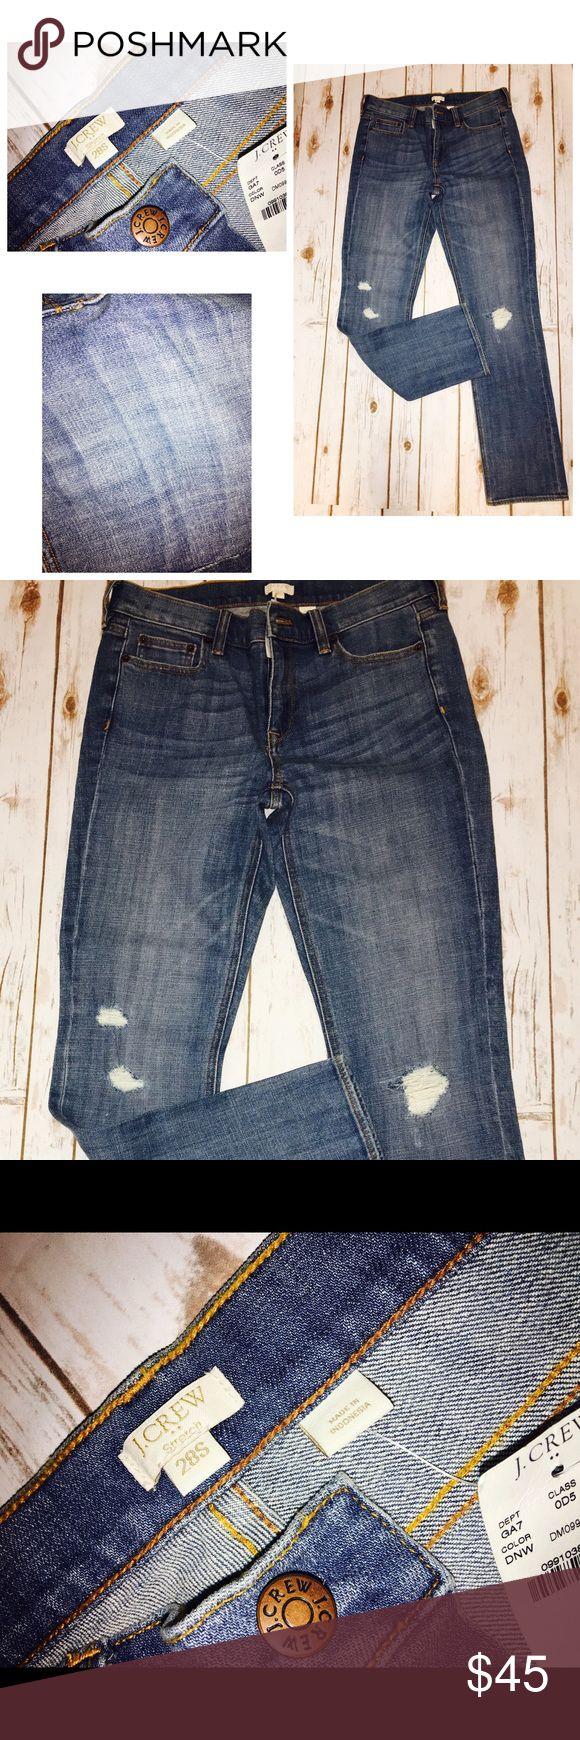 👖NWT J Crew Stretch Distressed Jeans Sz 28 Short J Crew Stretch Jeans Sz 28 Short...Distressed and NWT...great Jeans...wish they fit! J. Crew Jeans